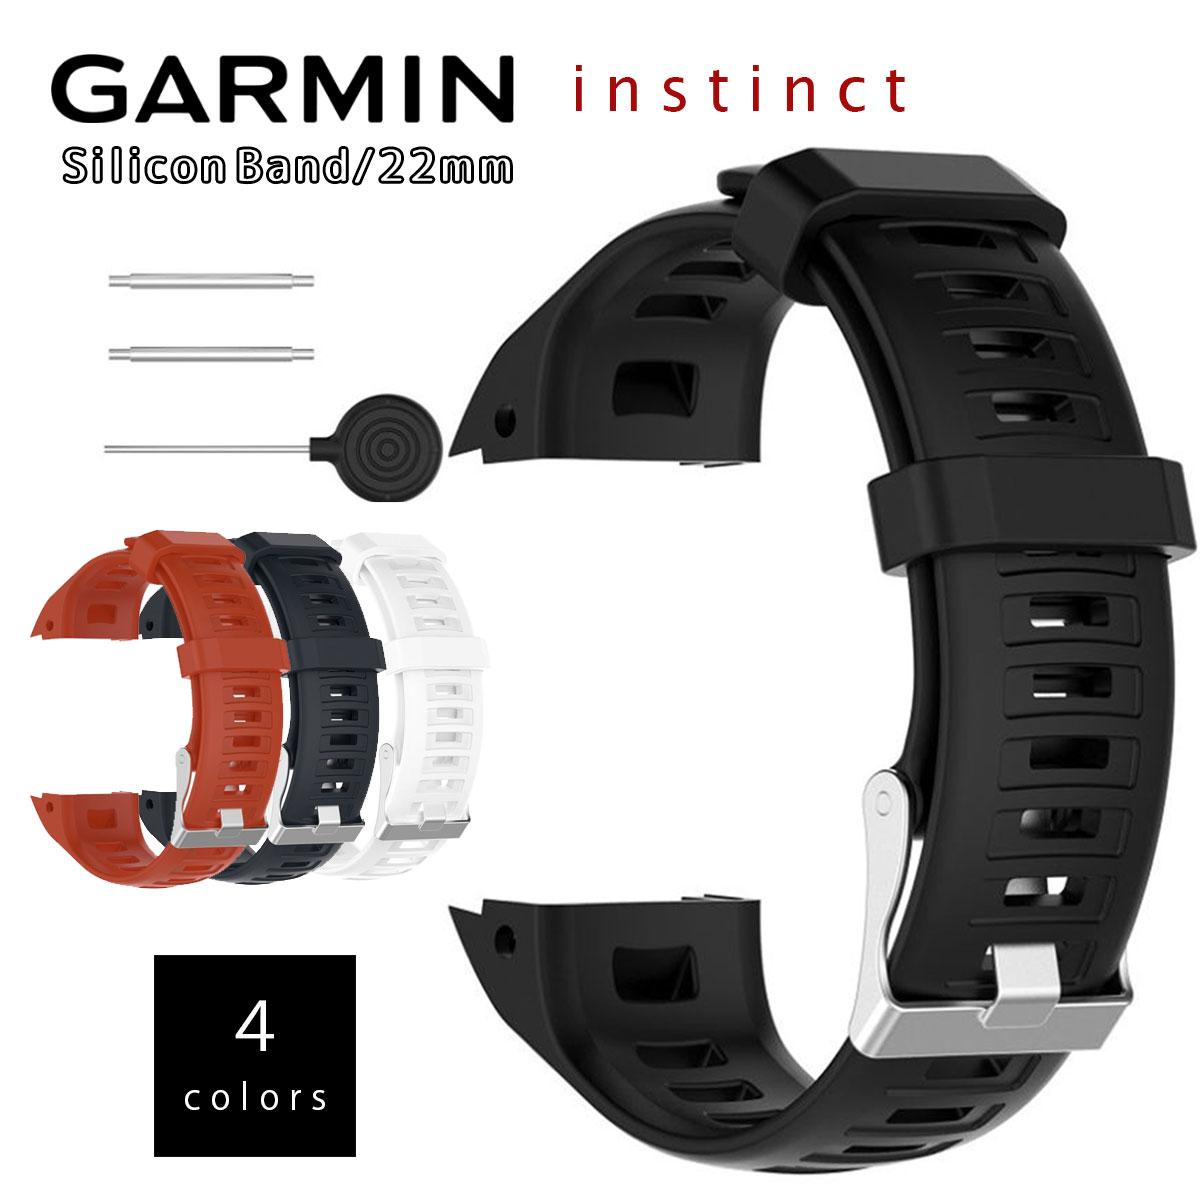 GARMIN instinct 交換 入荷予定 日本産 バンド ガーミン シリコン インスティンクト ベルト 対応